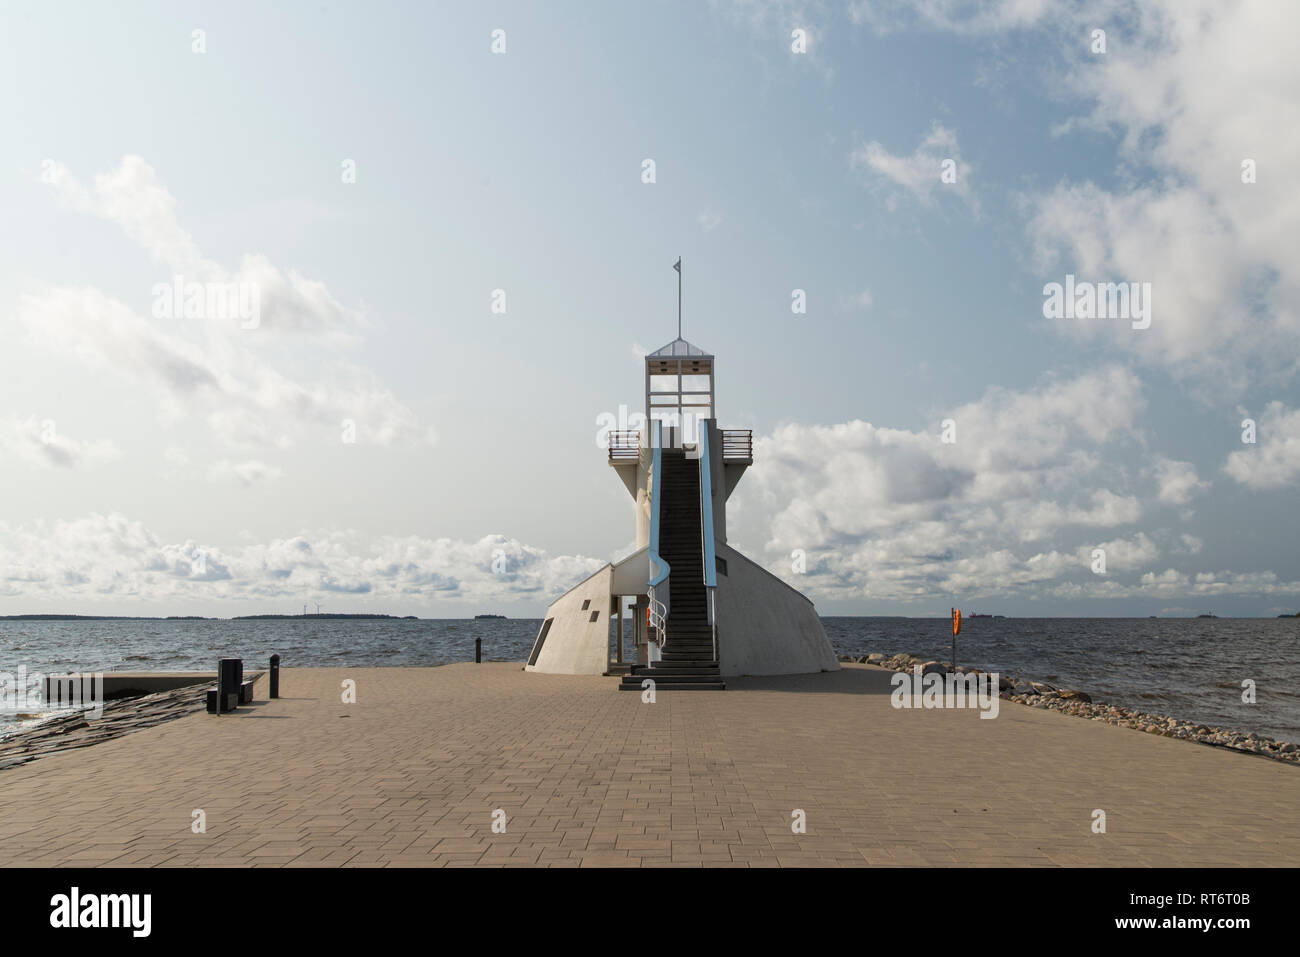 Nallikari Lighthouse in Oulu, Finland - Stock Image